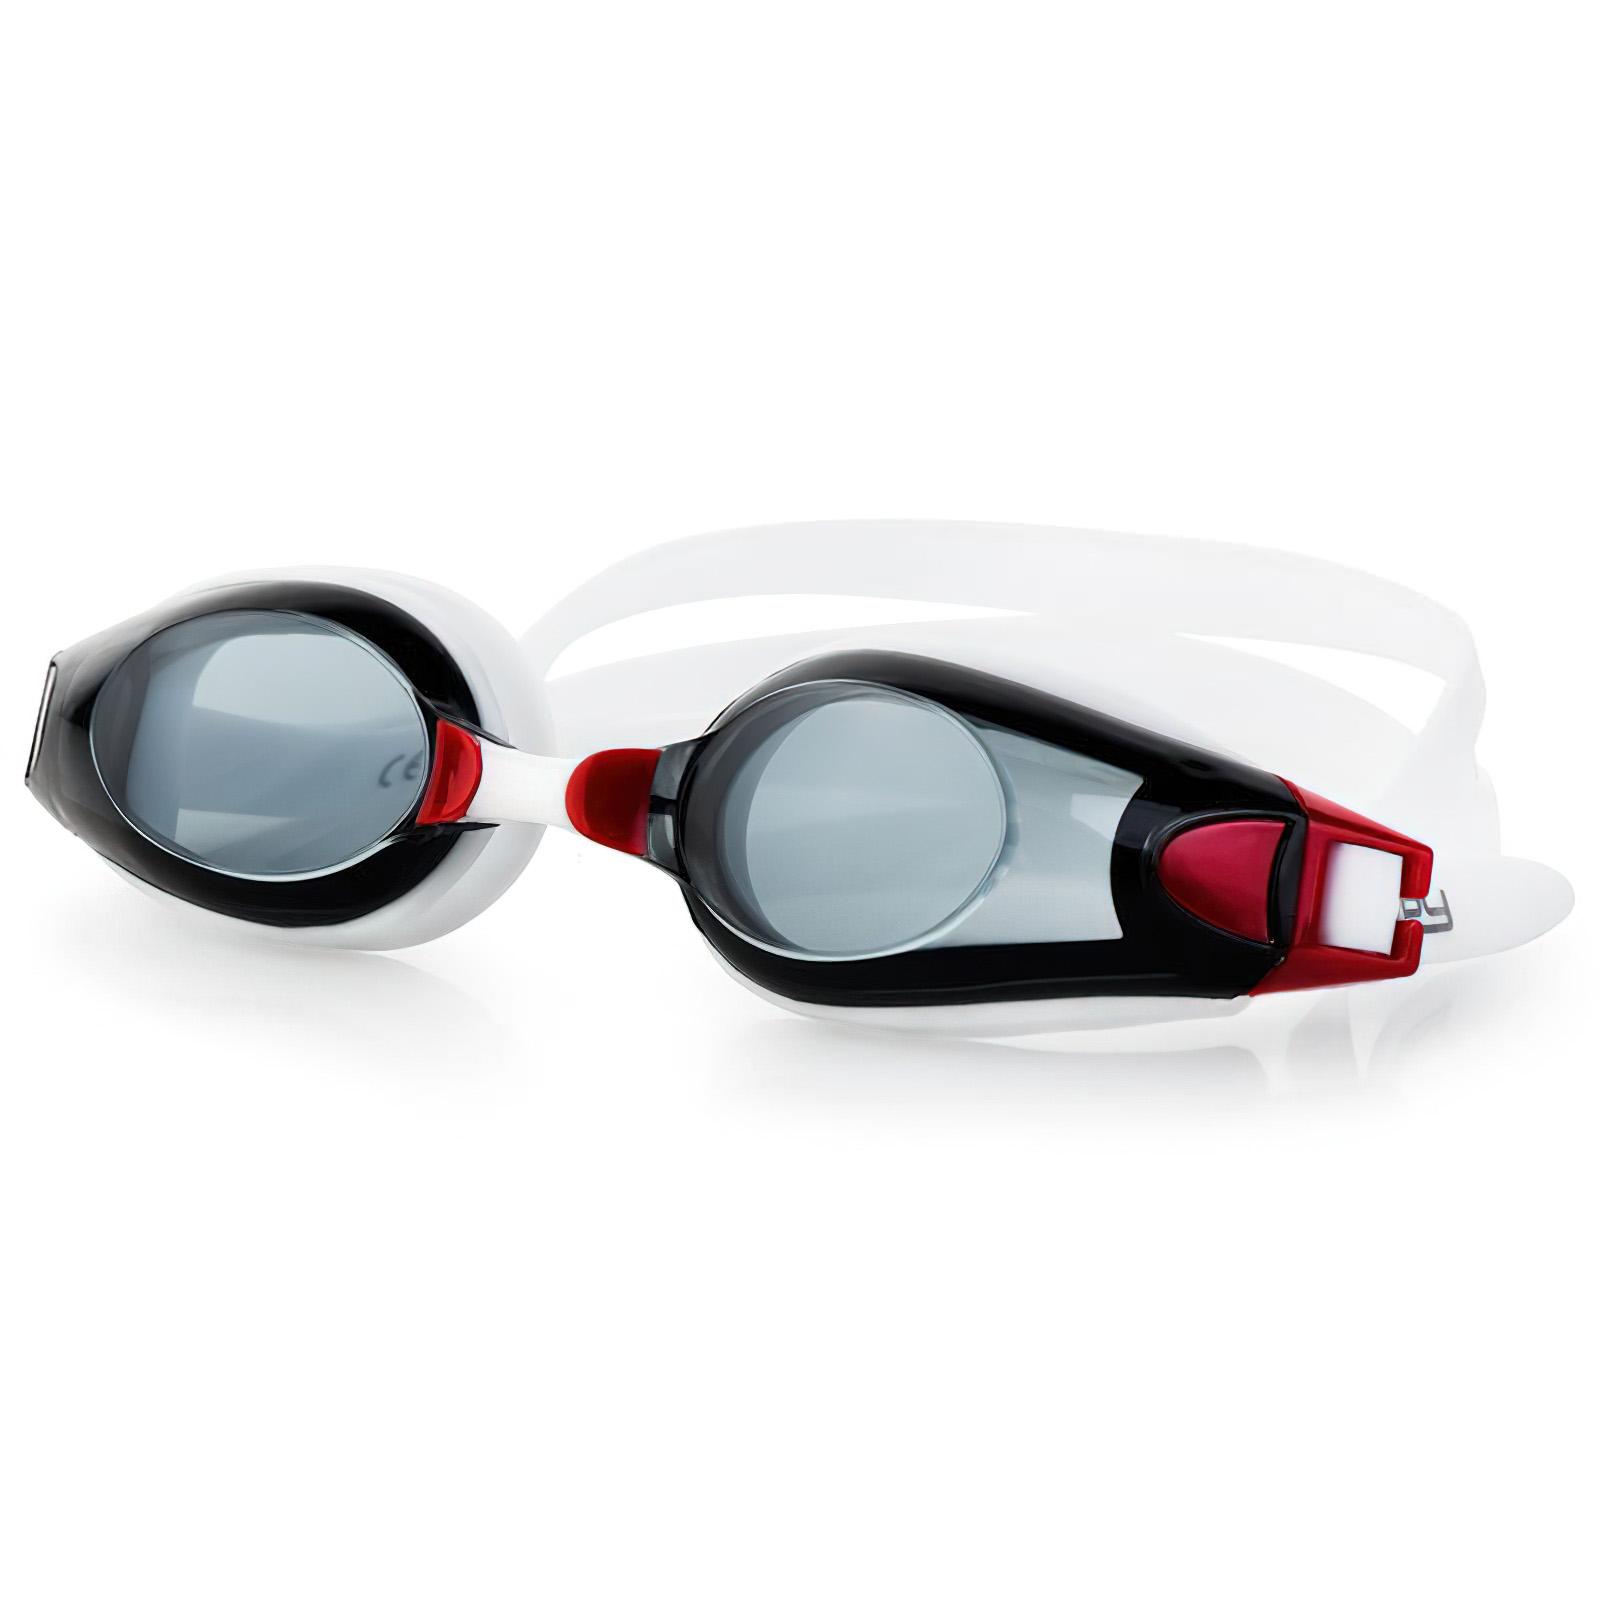 Plavecké brýle ROGER černo-červené